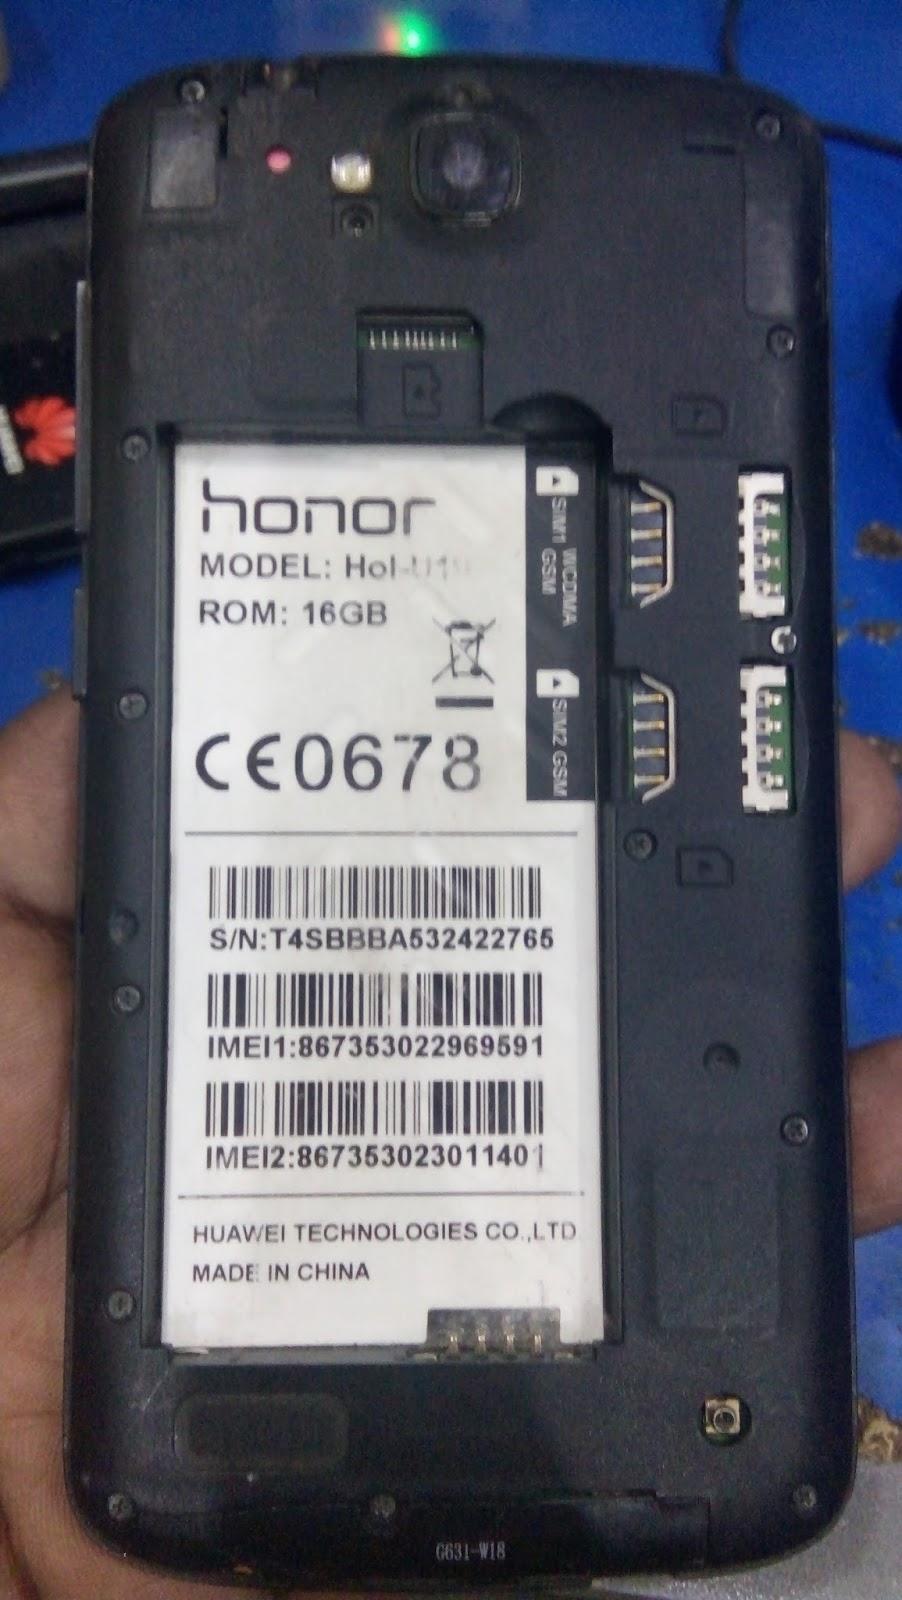 Mt6582  Huawei  Hol